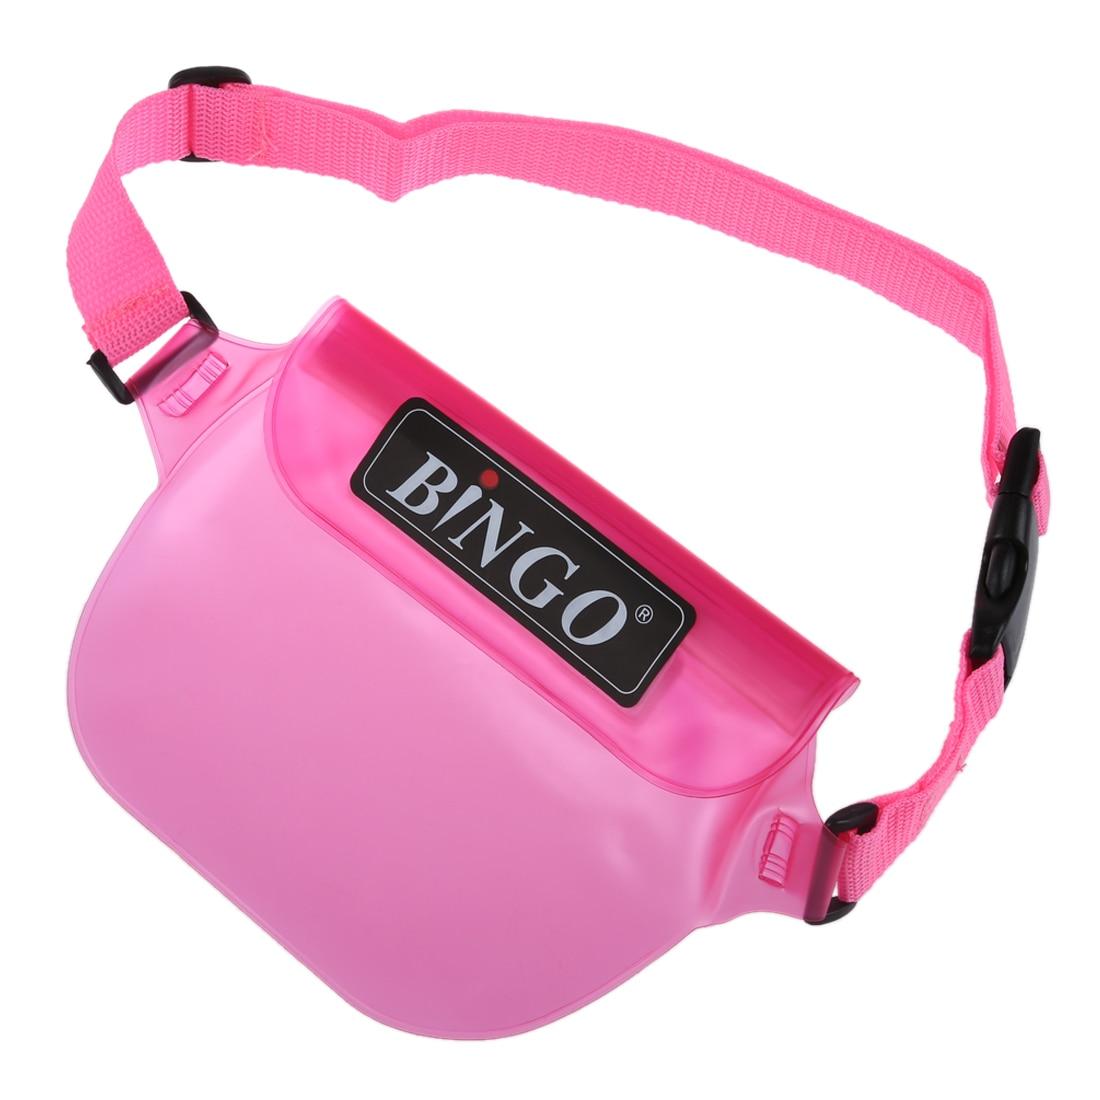 5 pcs of Bingo Waterproof Bag Rafting Waist Packs for Phone Wallet Purse Compact Camera(pink)